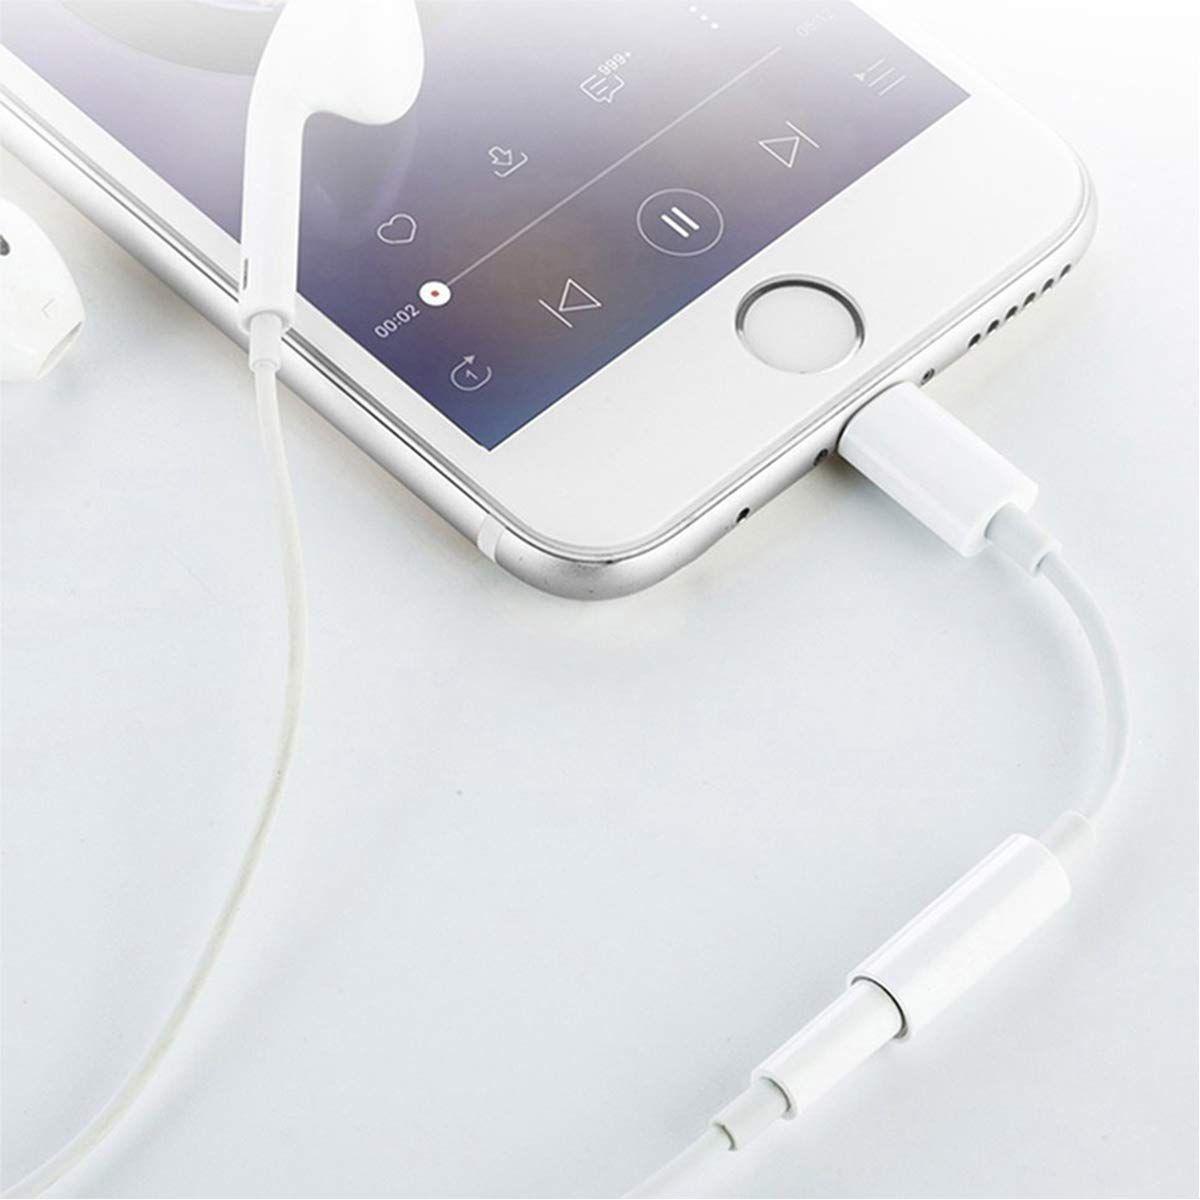 uk availability cd727 73da1 Headphone Jack Adapter for iPhone 3.5mm Earphone Adaptor compatible ...